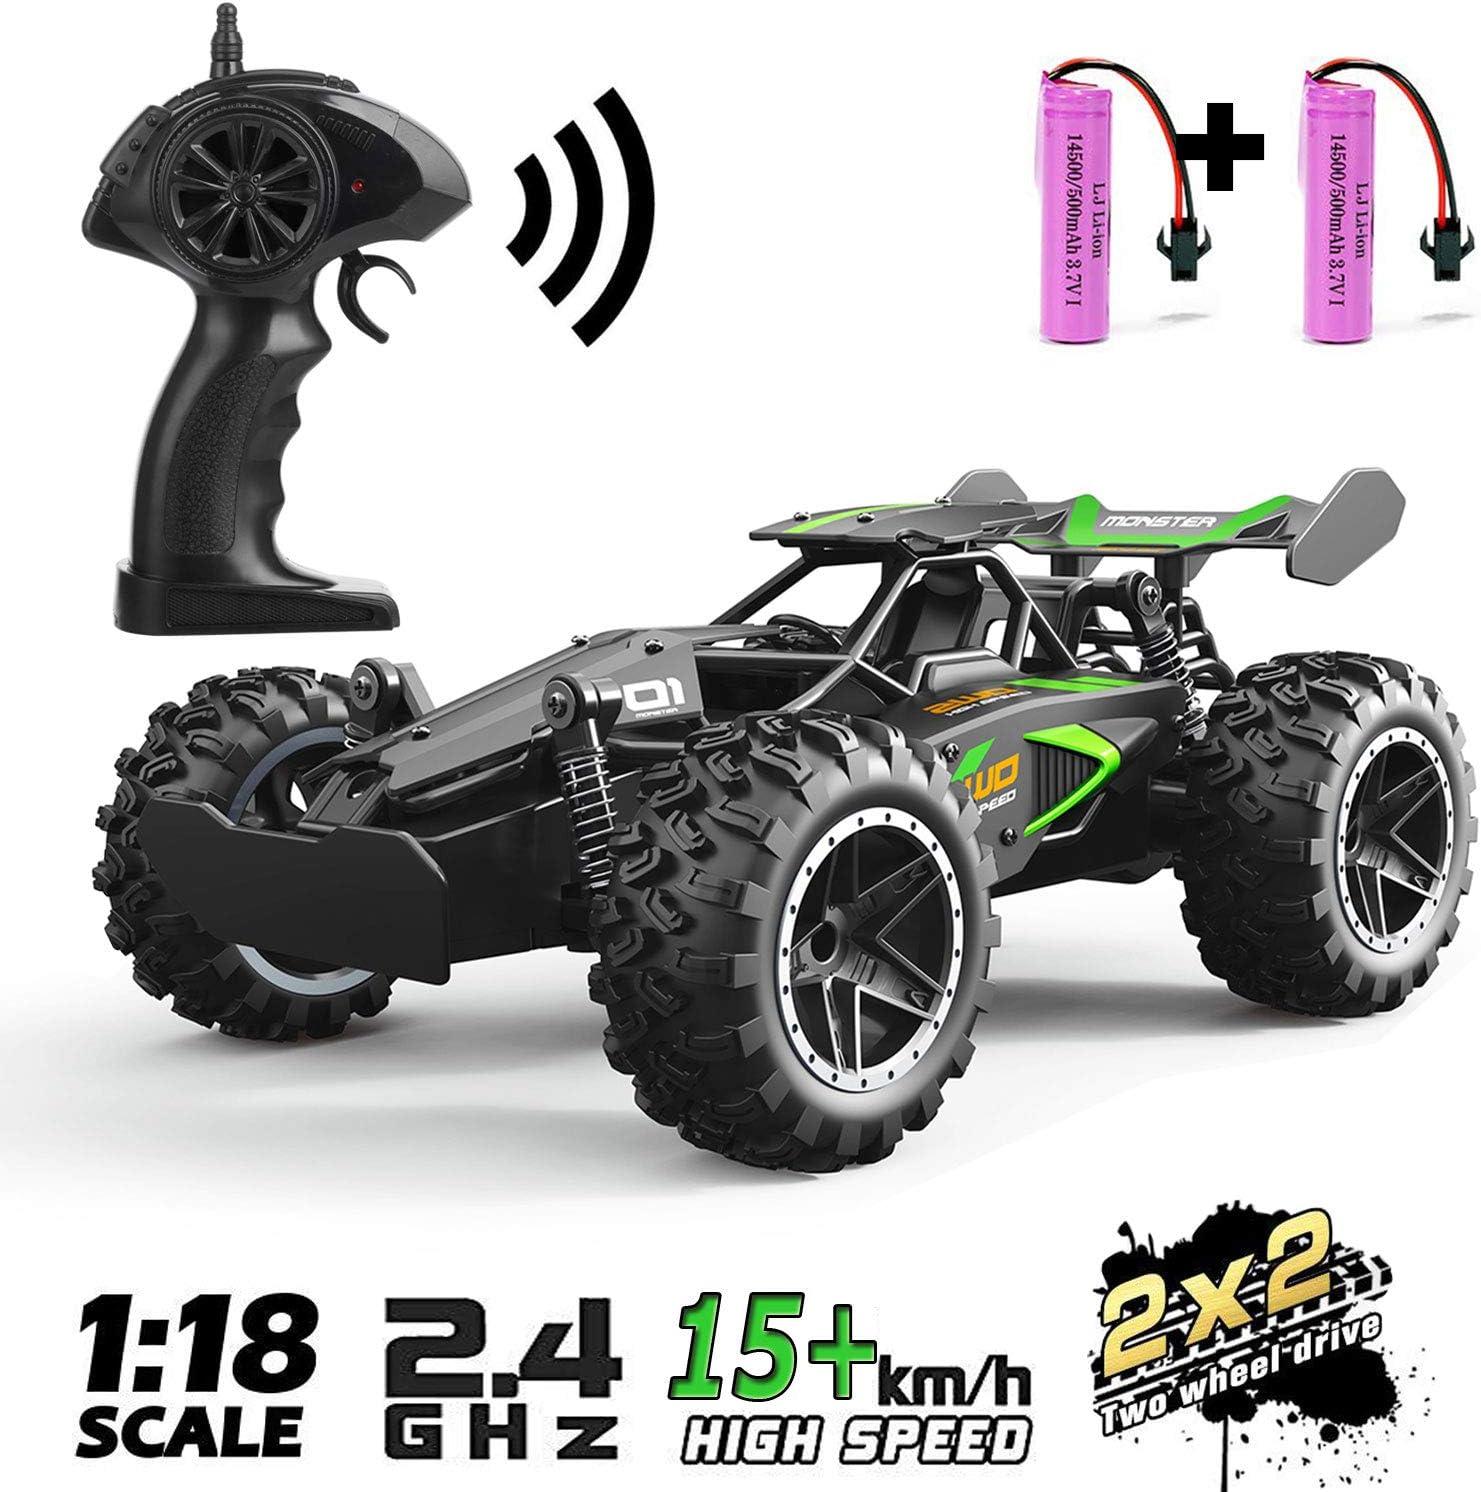 SZJJX RC 2.4Ghz Control Remoto Camión 20KM / H Alta Velocidad 2WD Off-Road RTR Electric Rock Climber Fast Race Buggy Hobby Car Toy para niños Regalo, 1: 18-Verde